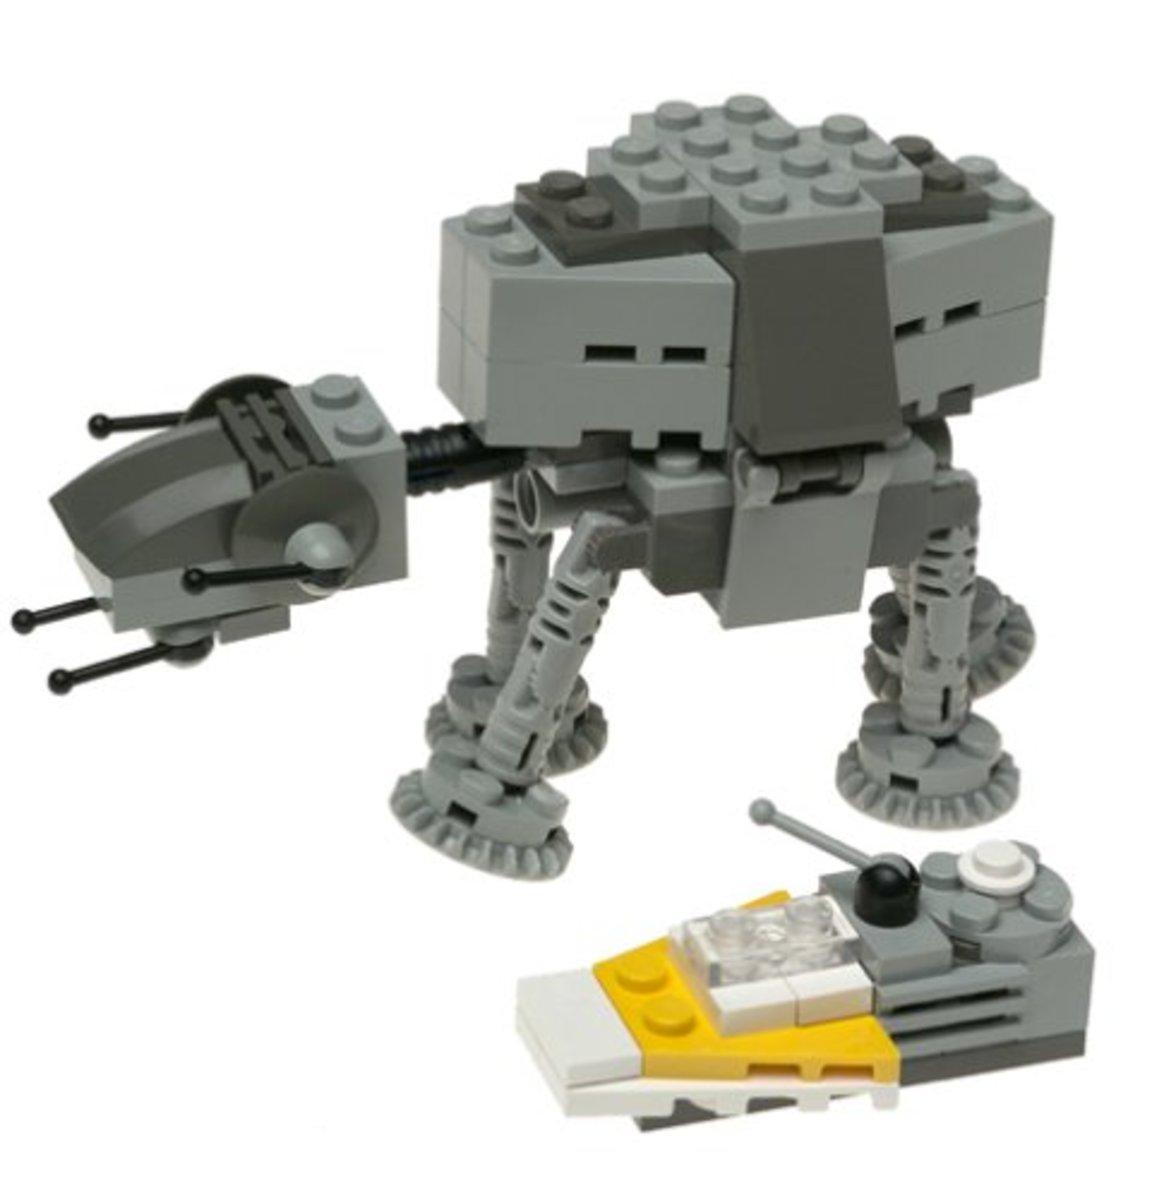 LEGO Star Wars Mini AT-AT 4489 Assembled